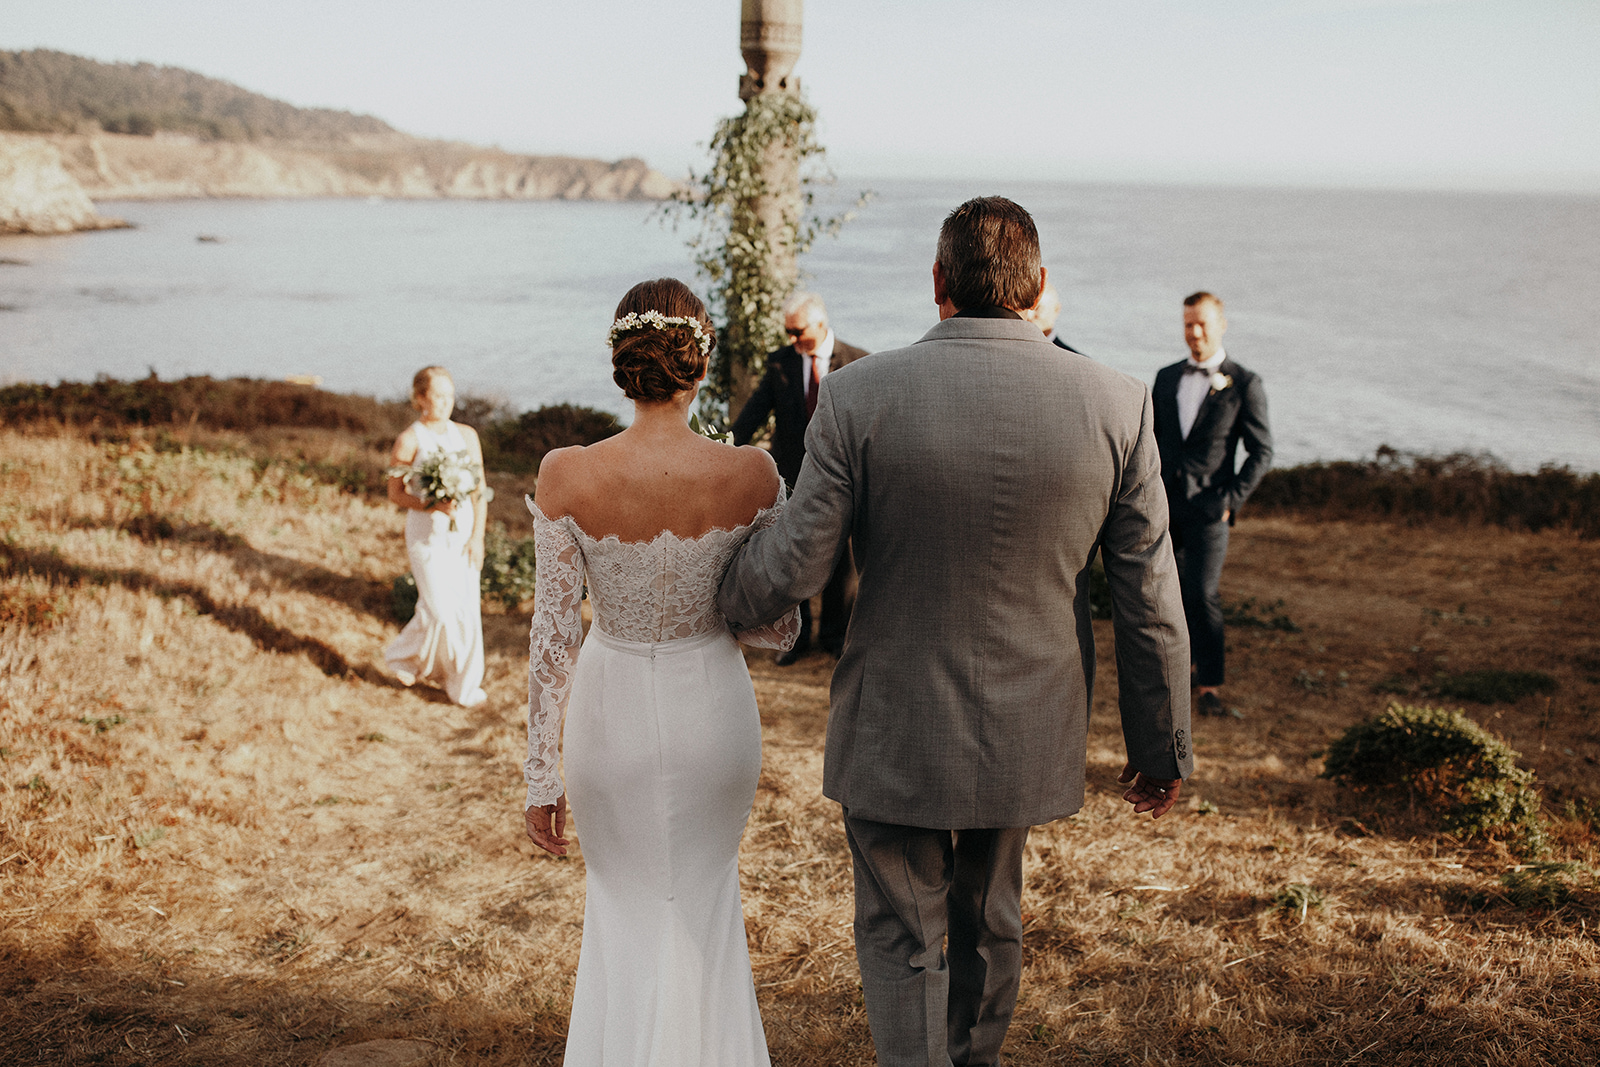 Sonoma Coast Wedding Featured on Green Wedding Shoes12.jpg